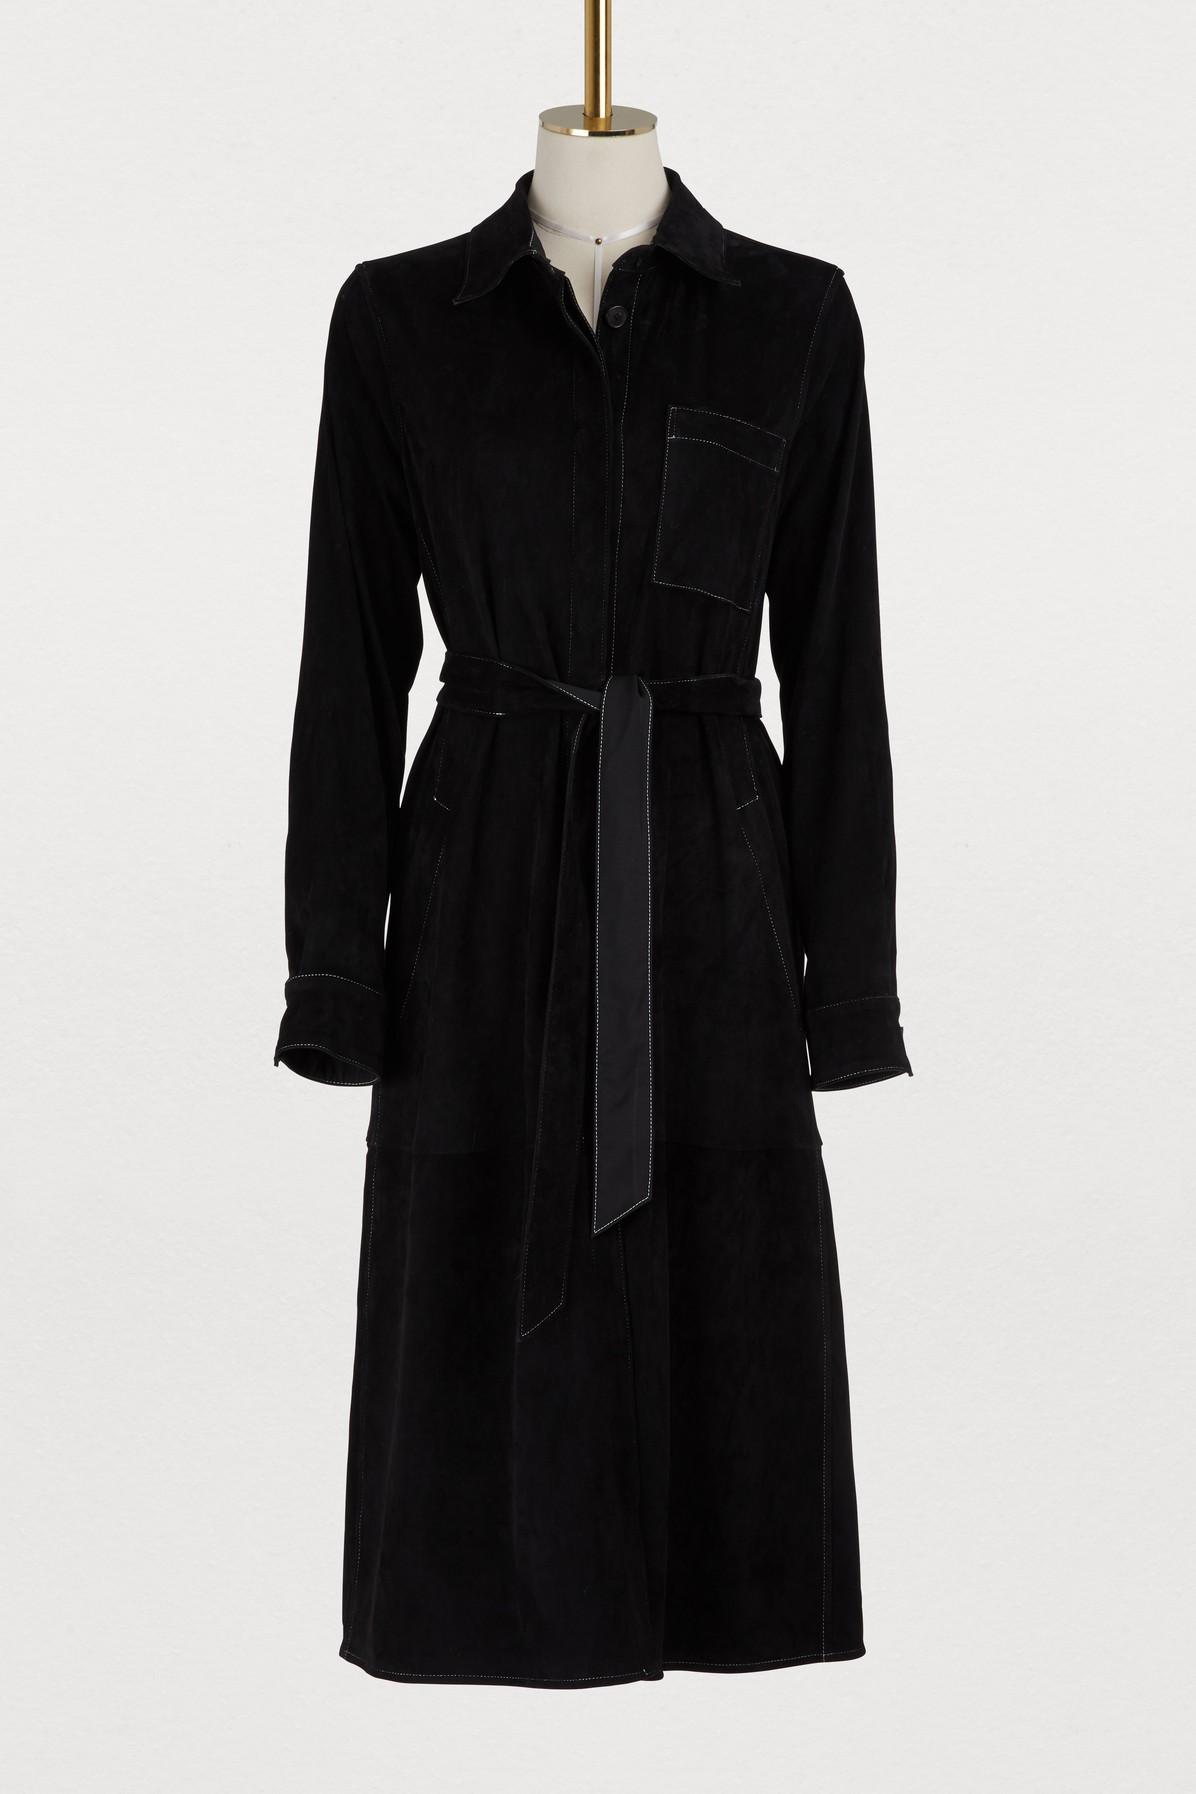 Robe avec ceinture en cuir